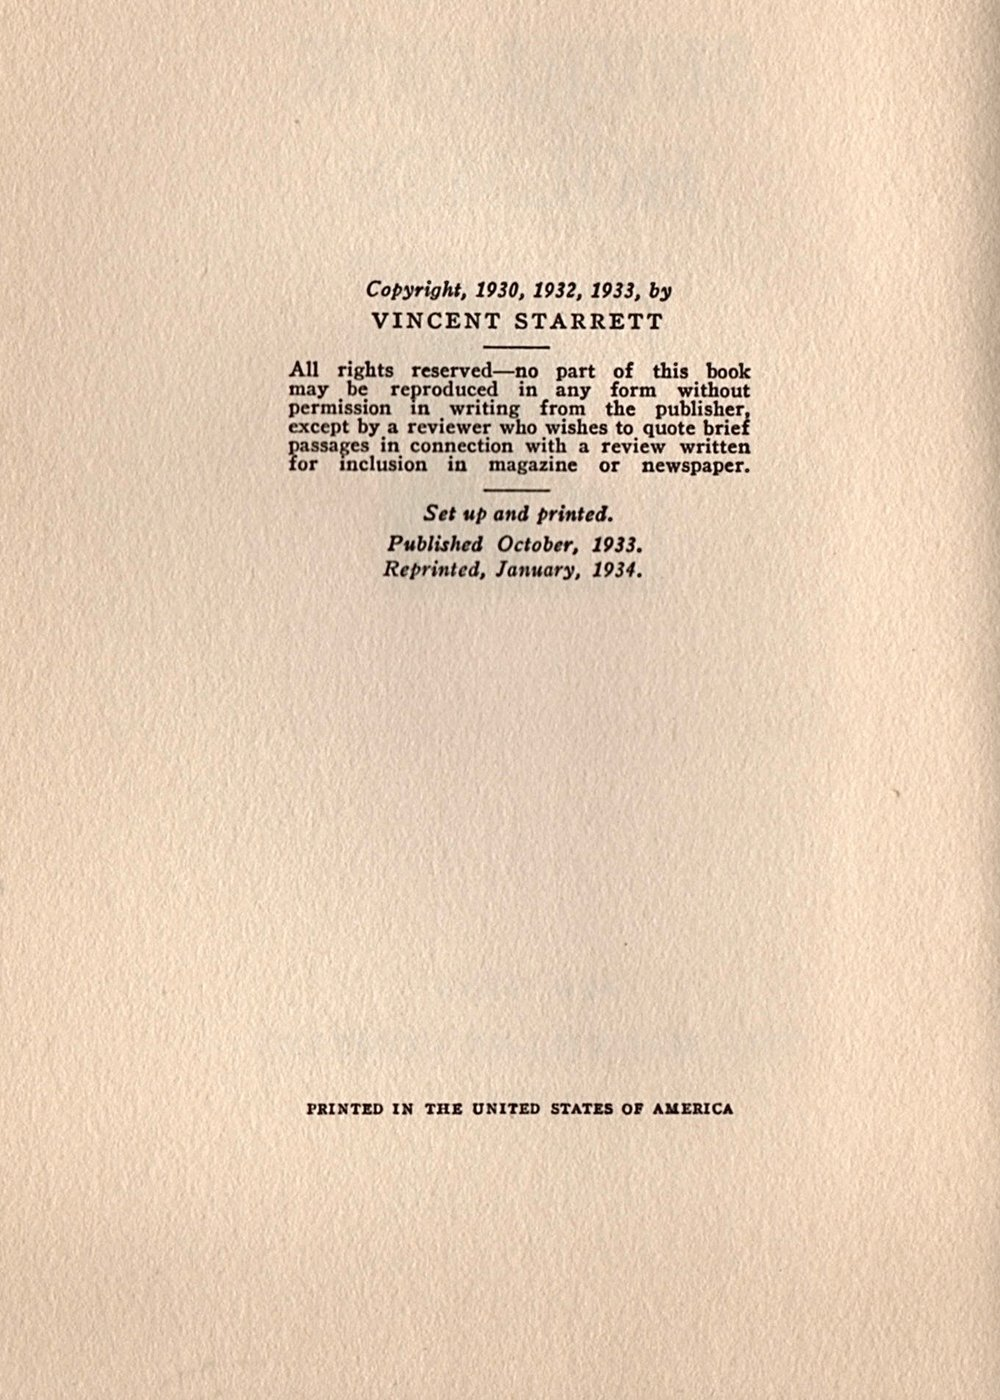 TPLOSH 1934 Second Edition.jpg